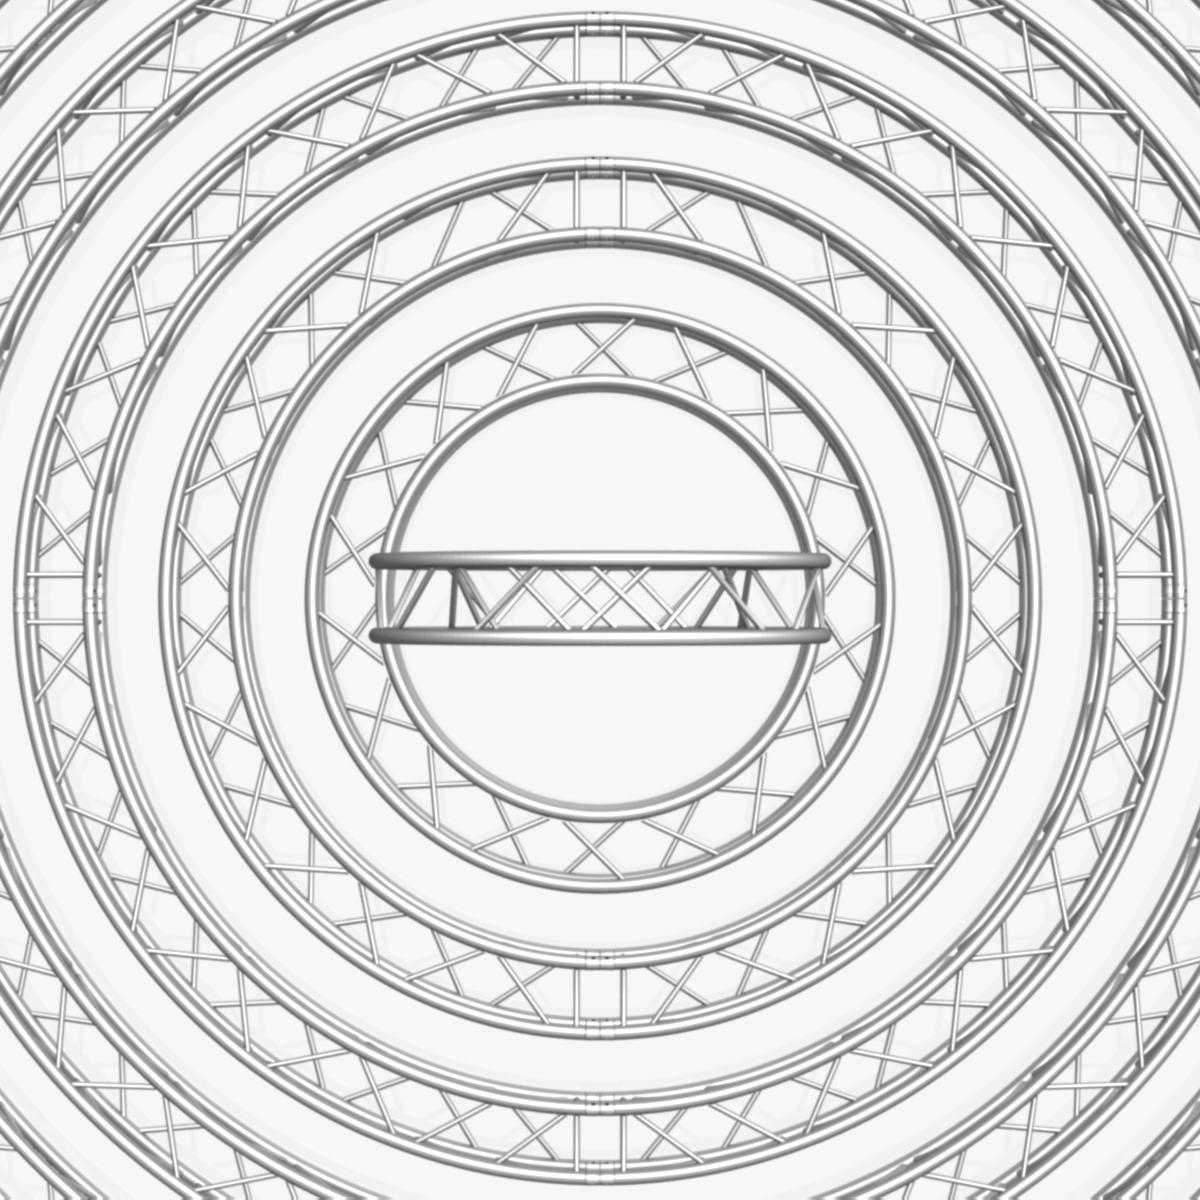 circle square truss modular collection 10 modular pieces by canan85 Mac iPhone a7